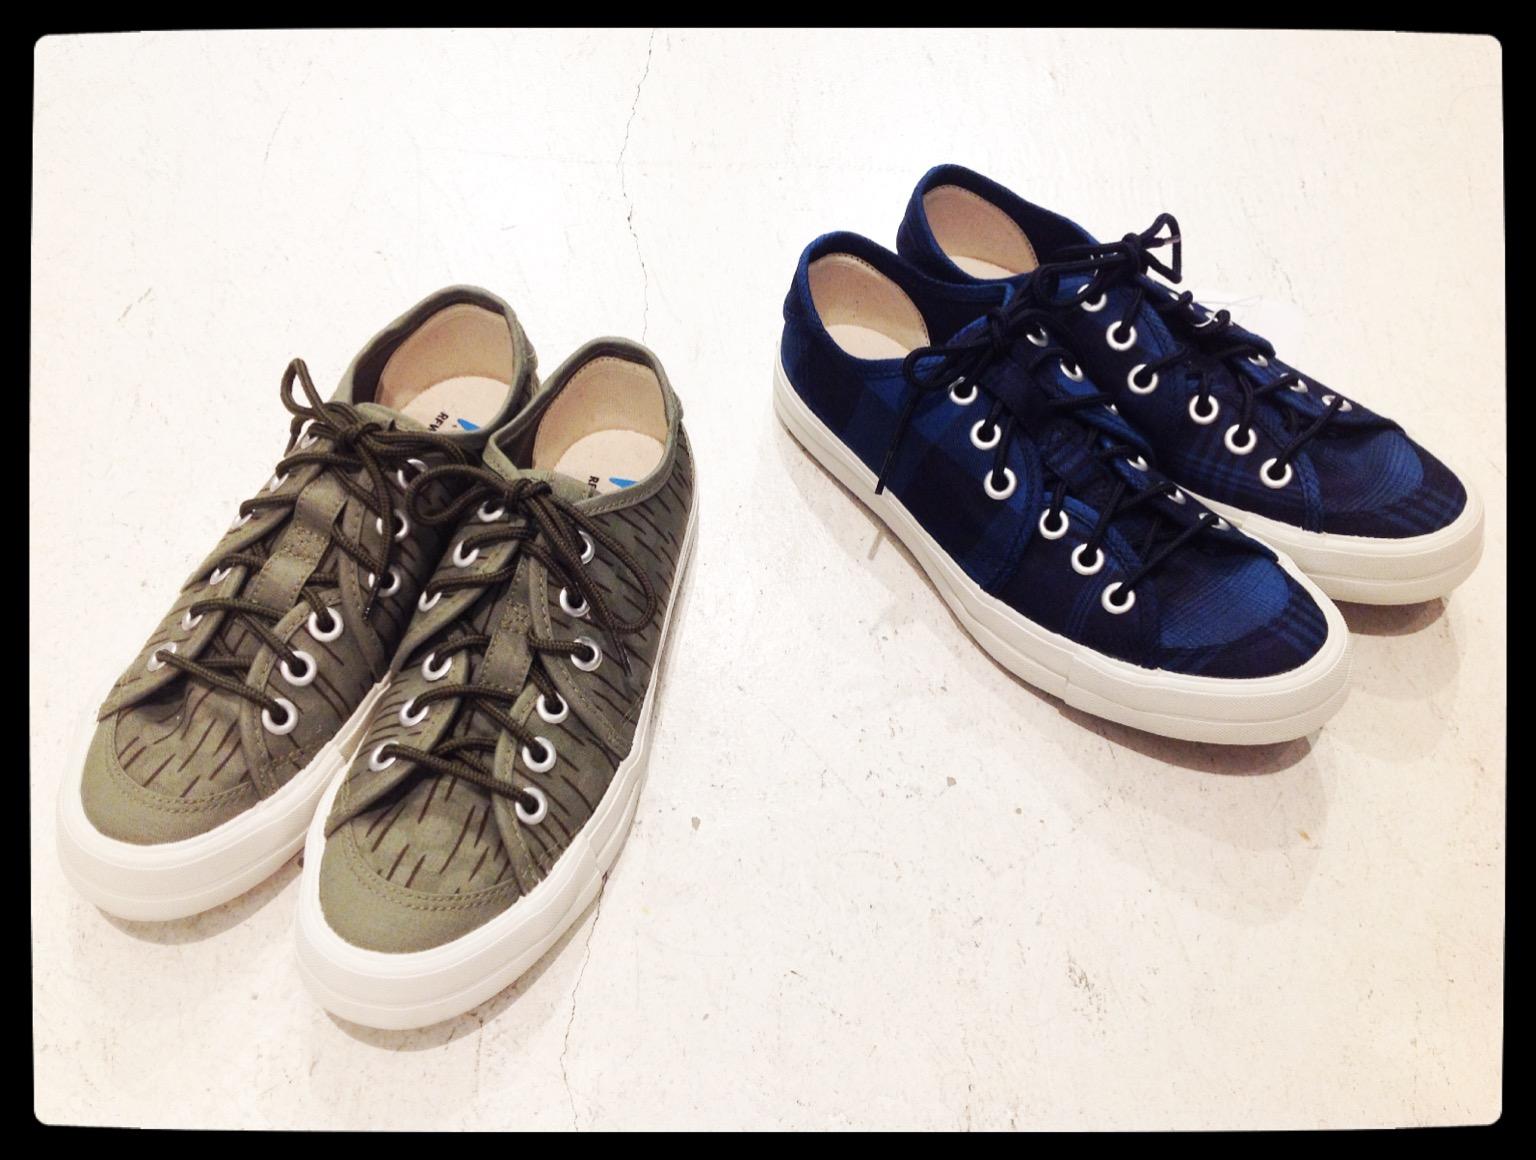 RFW【アールエフダブリュー】SANDWICH-LO CHECK/RAIN KAMO Sneakers▼香川・綾川店